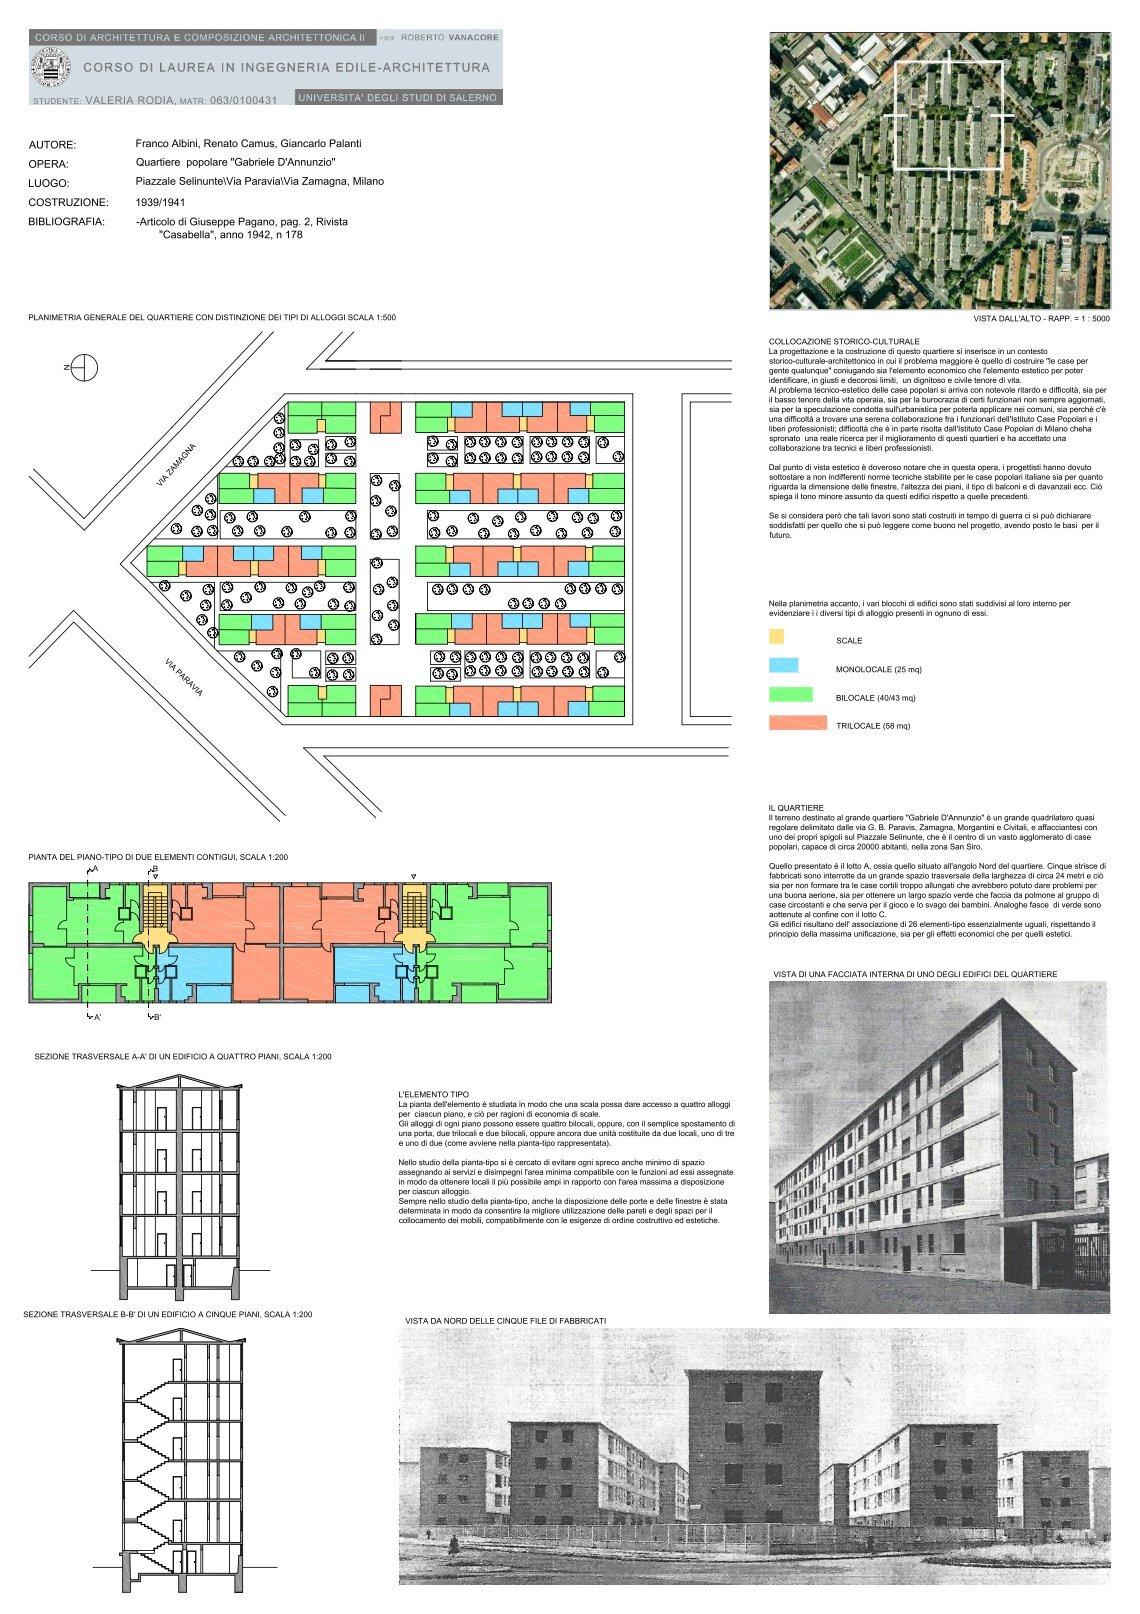 Beautiful Via Zamagna Milano Images - Design & Ideas 2018 ...